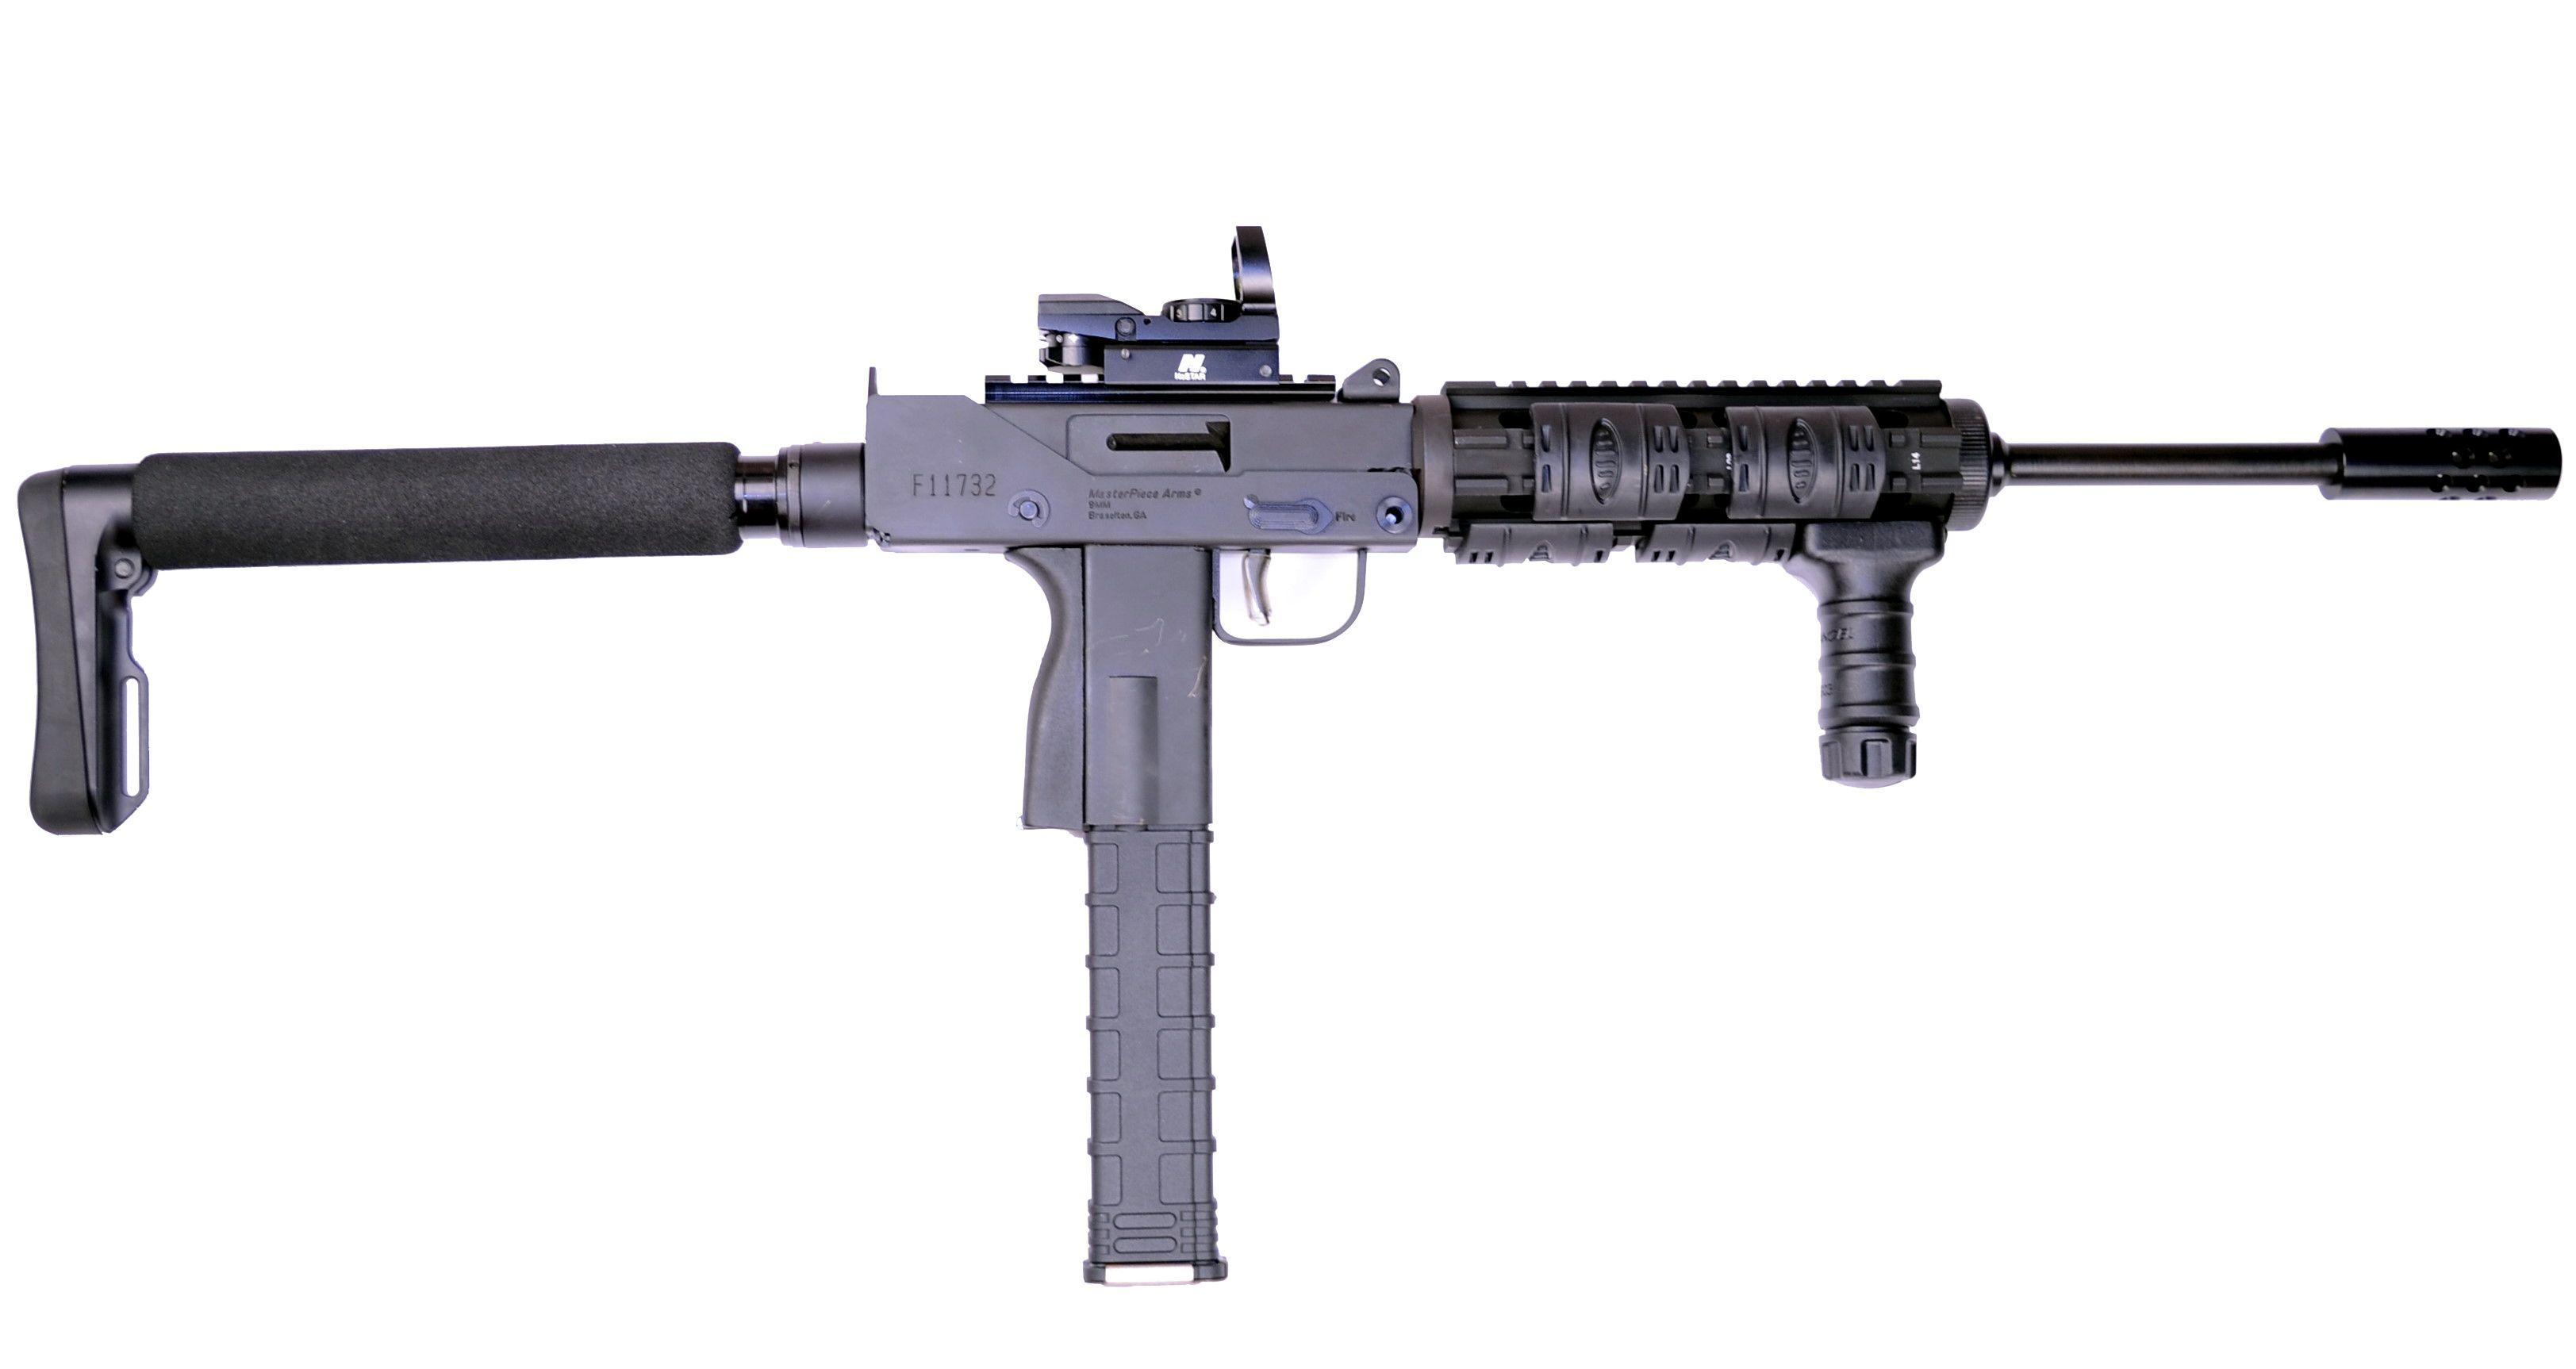 MasterPiece Arms Unveils 9300 SST-X Tactical Carbine I